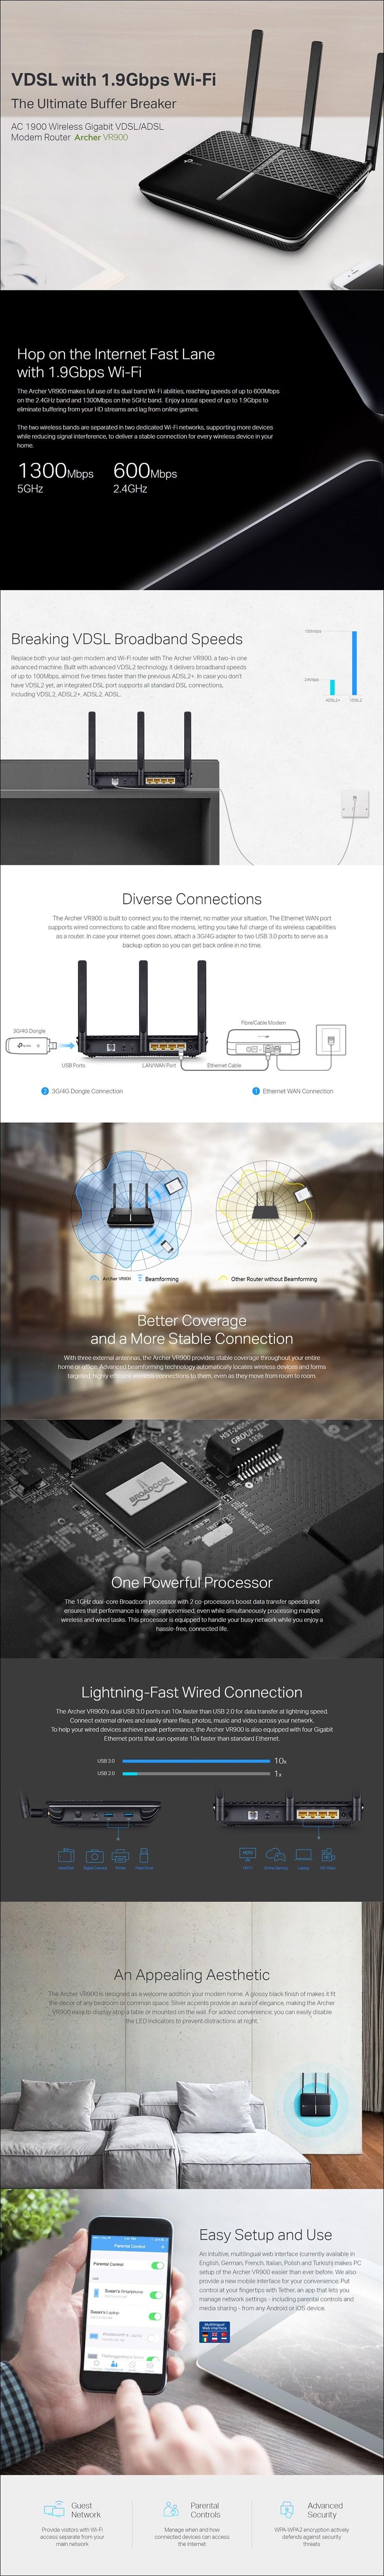 TP-Link Archer VR900 AC1900 Wireless VDSL/ADSL Modem Router - NBN Ready - Overview 1